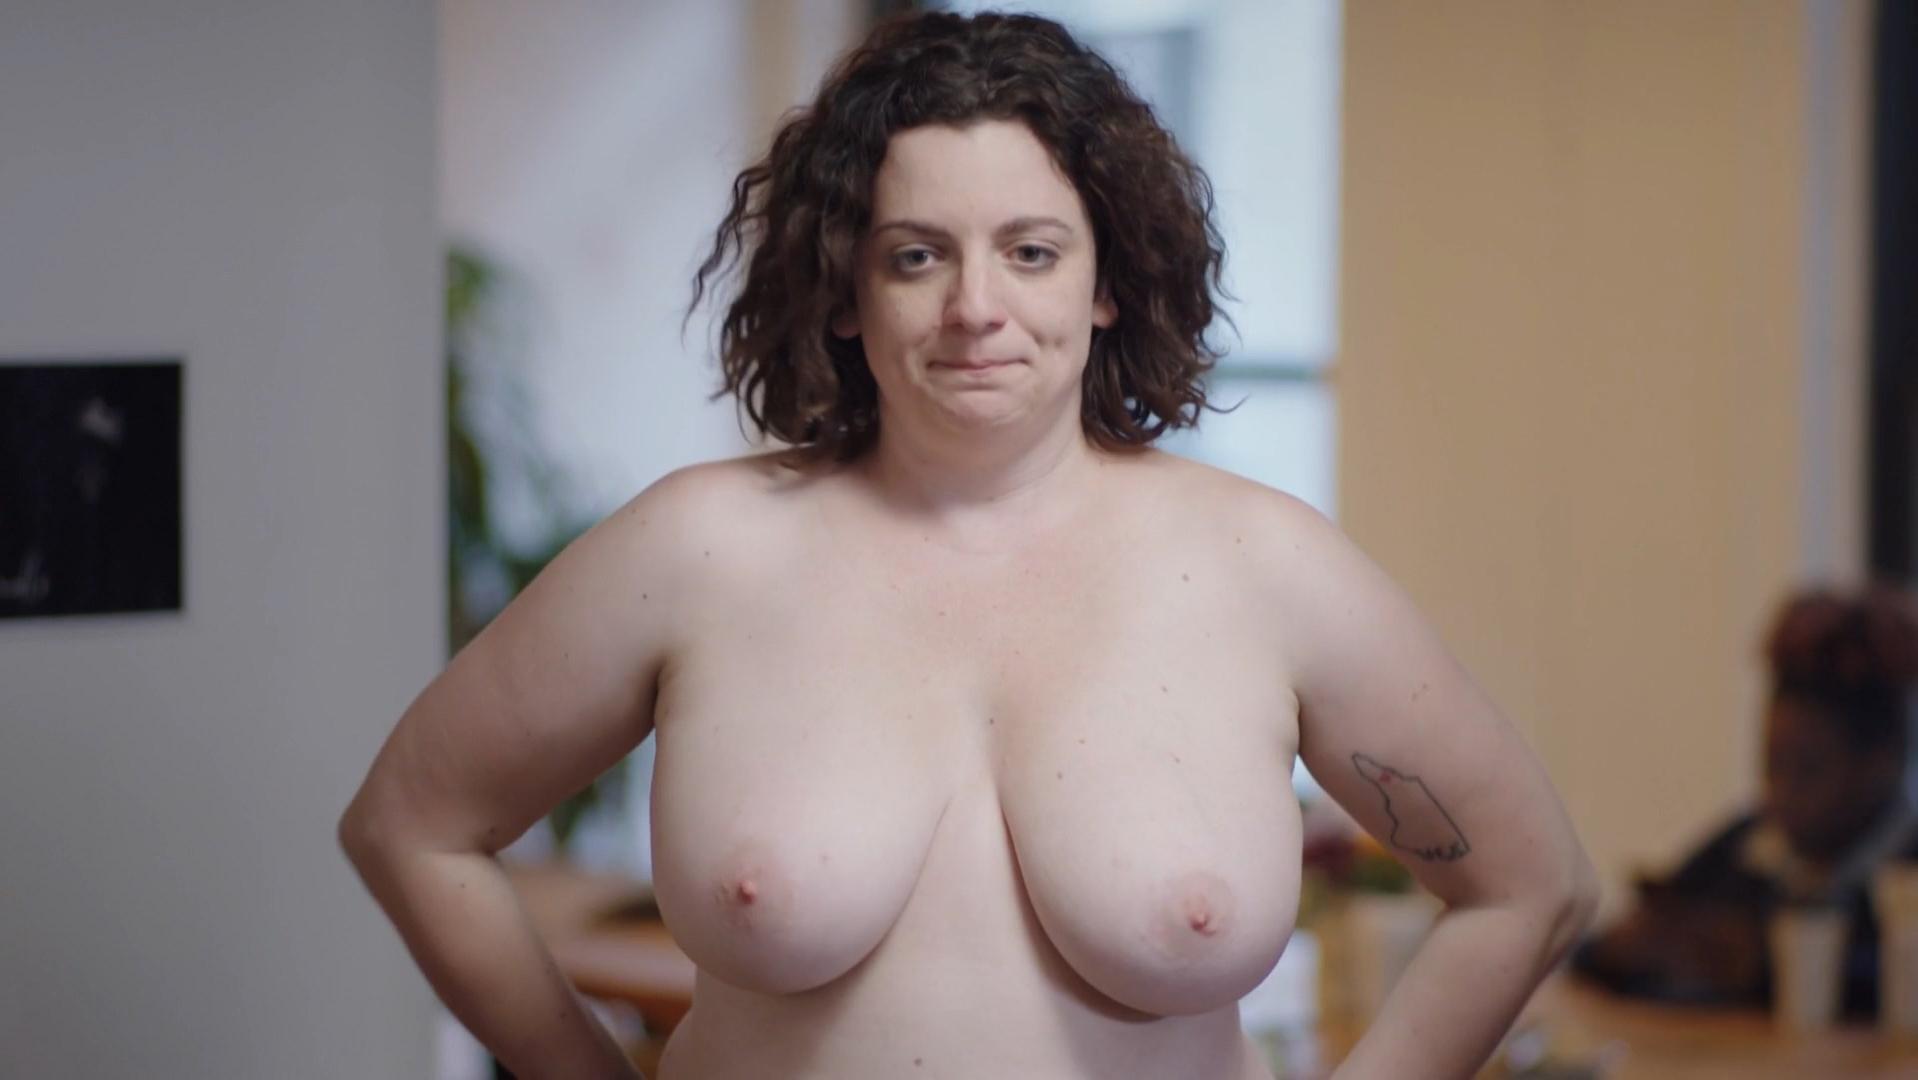 Louisa krause nude sex scene on scandalplanetcom 10